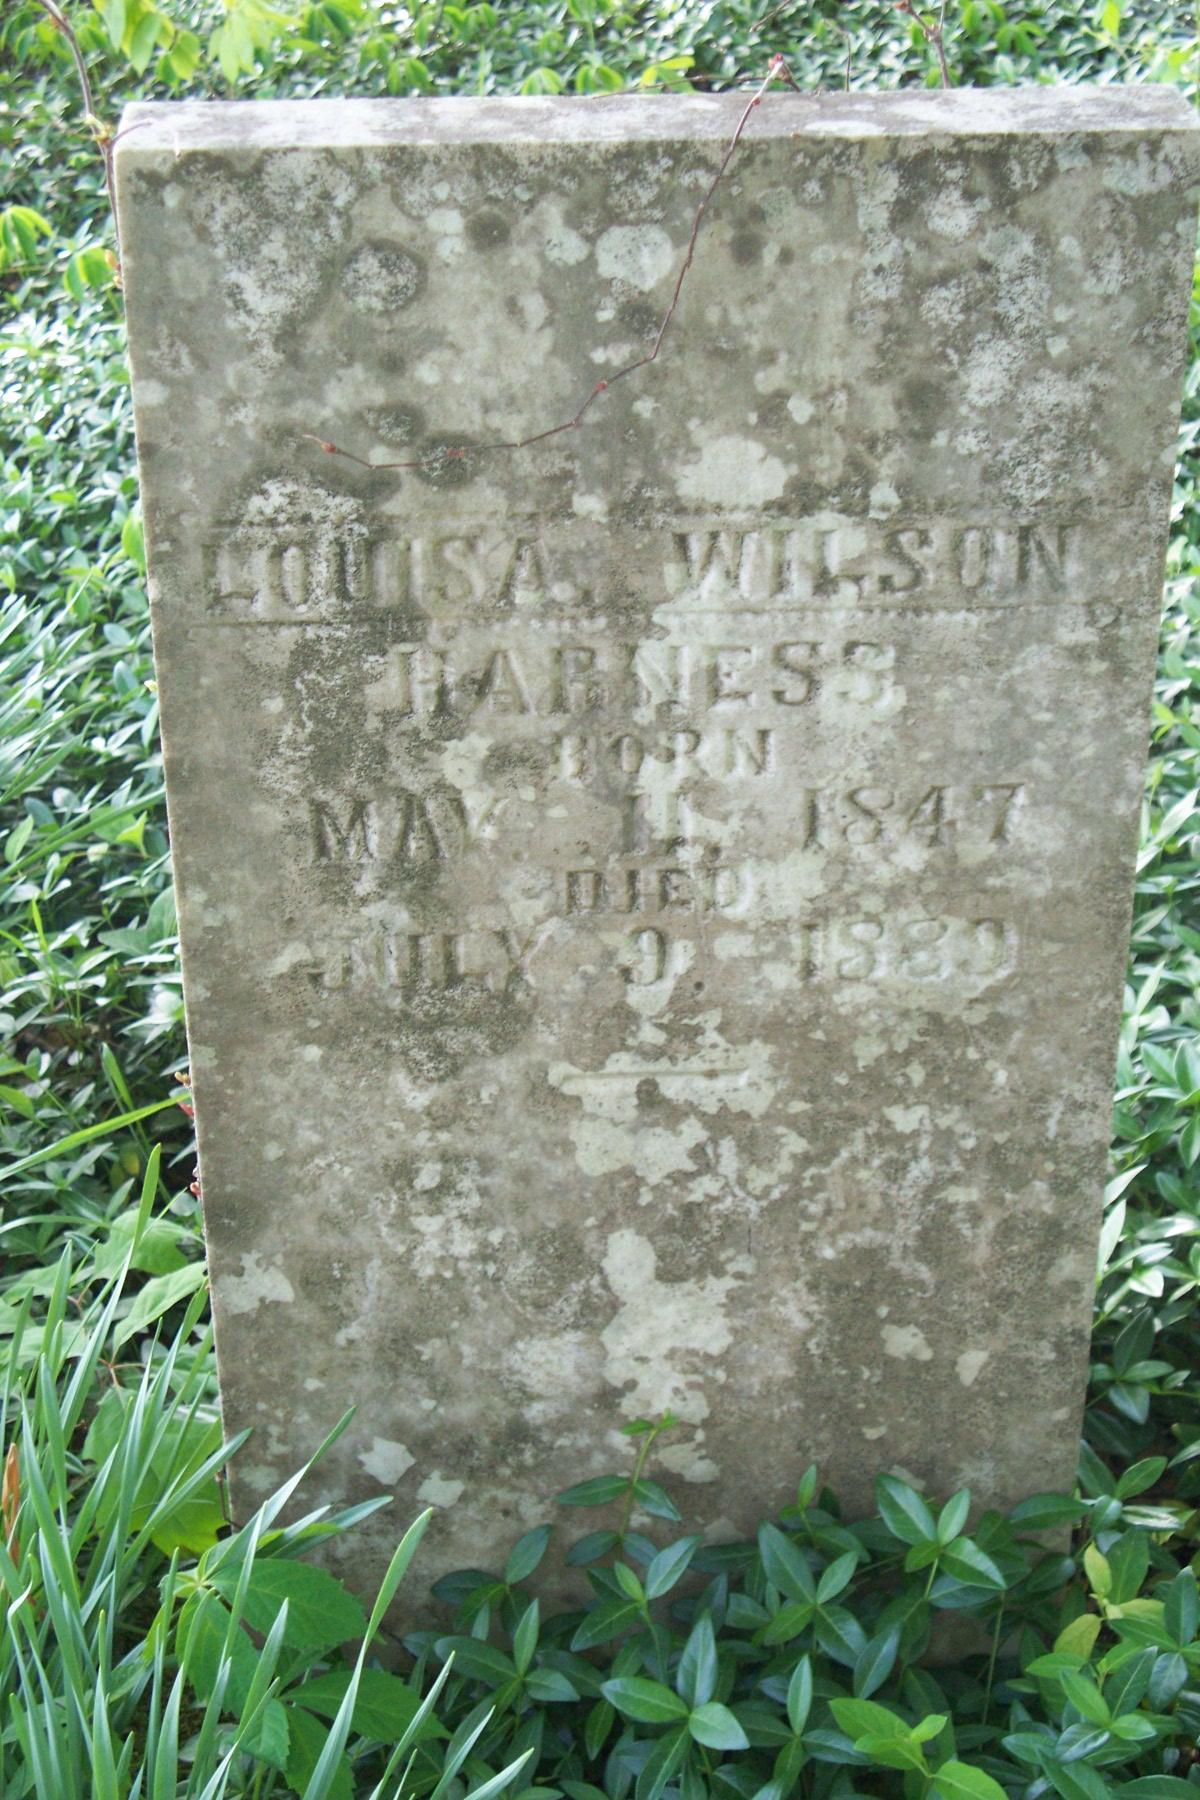 Louisa Wilson Harness